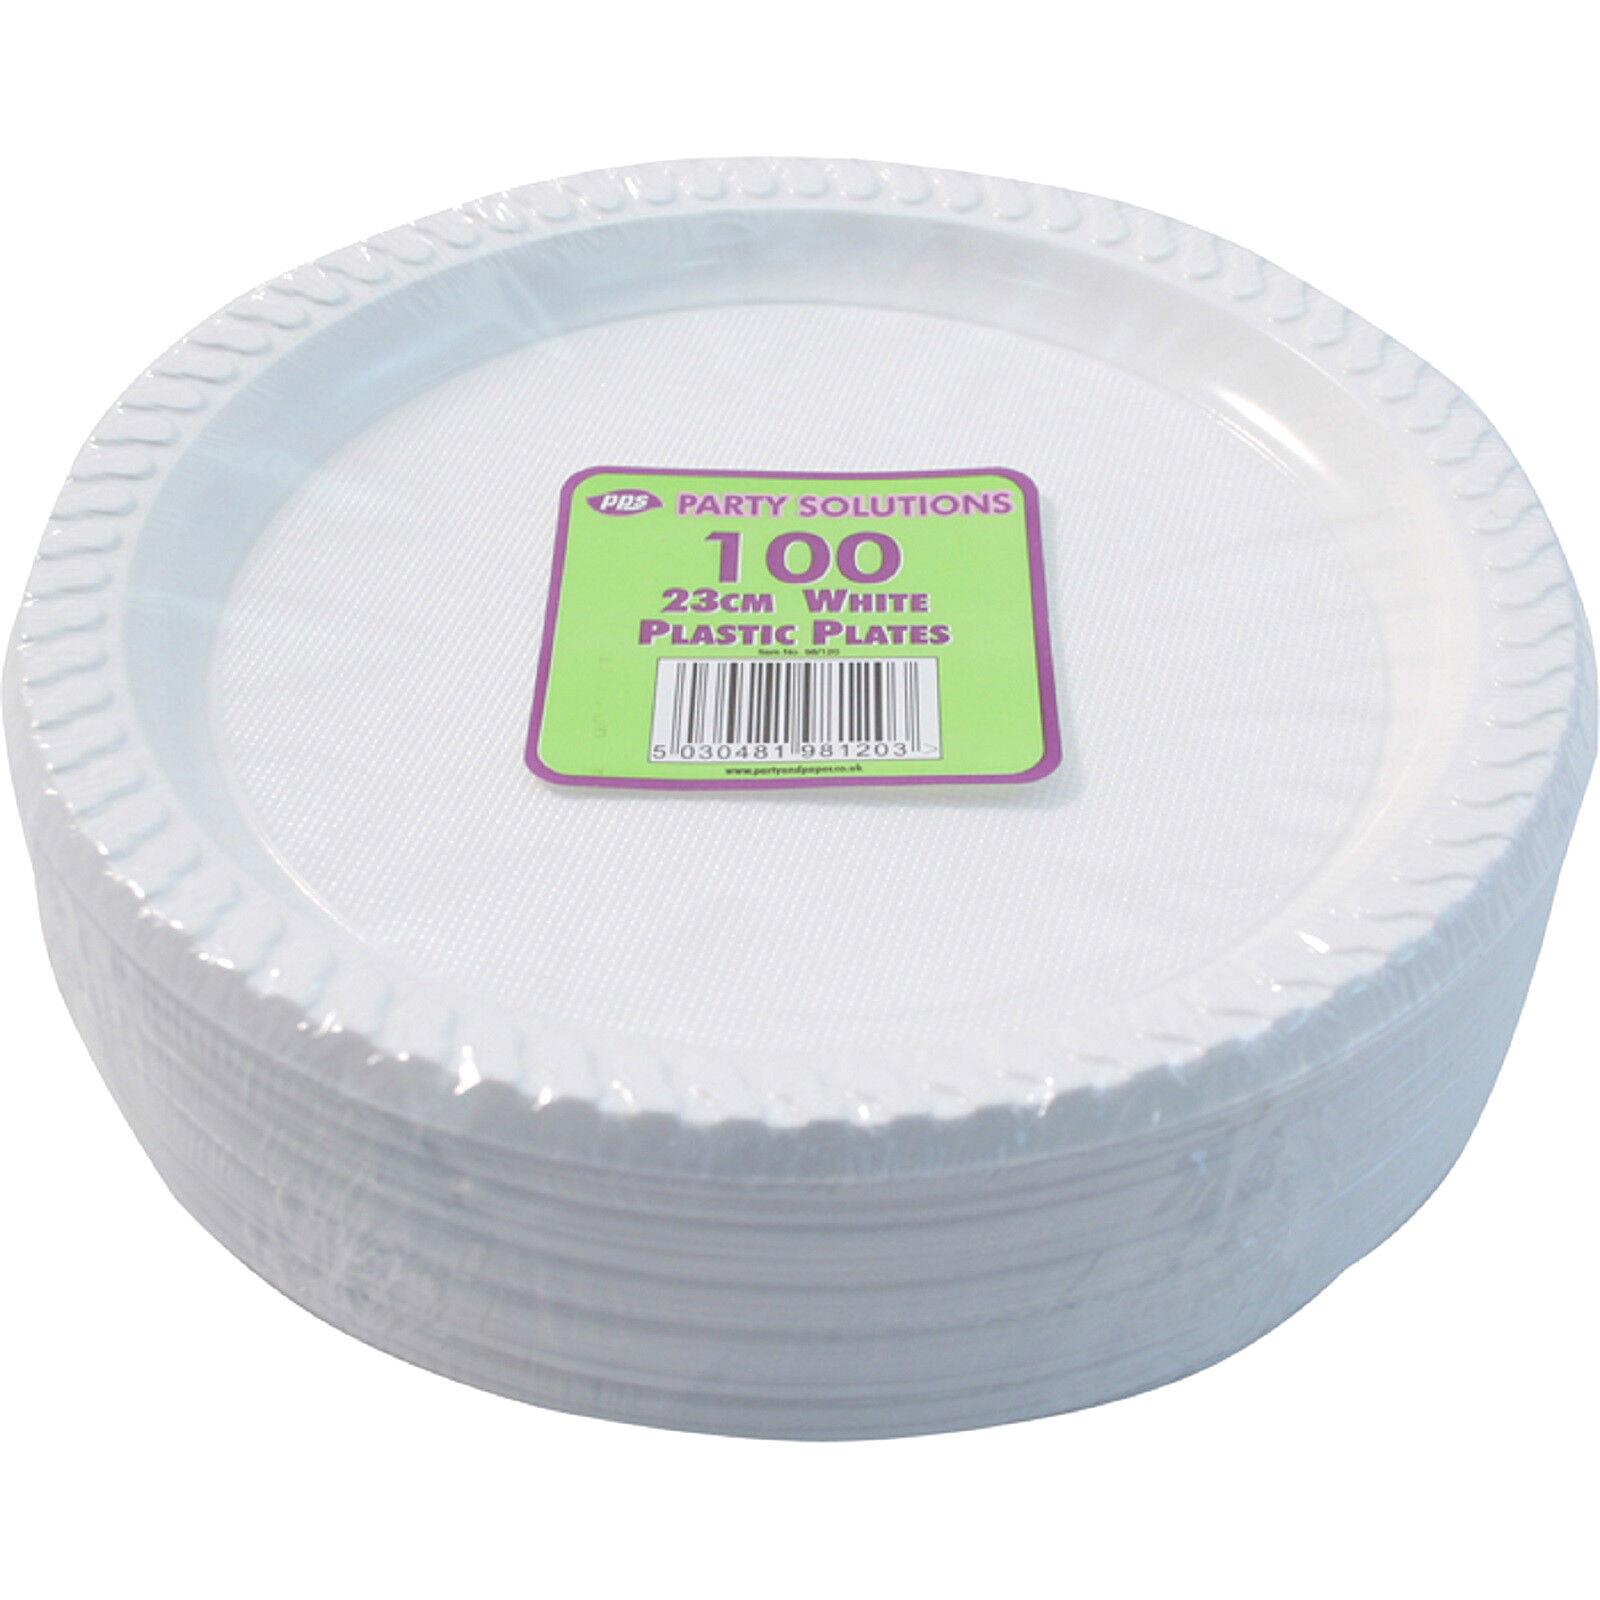 2000 x Weiß PLASTIC PLATES ROUND 23cm 9  TABLEWARE PARTY BIRTHDAY DISPOSABLE